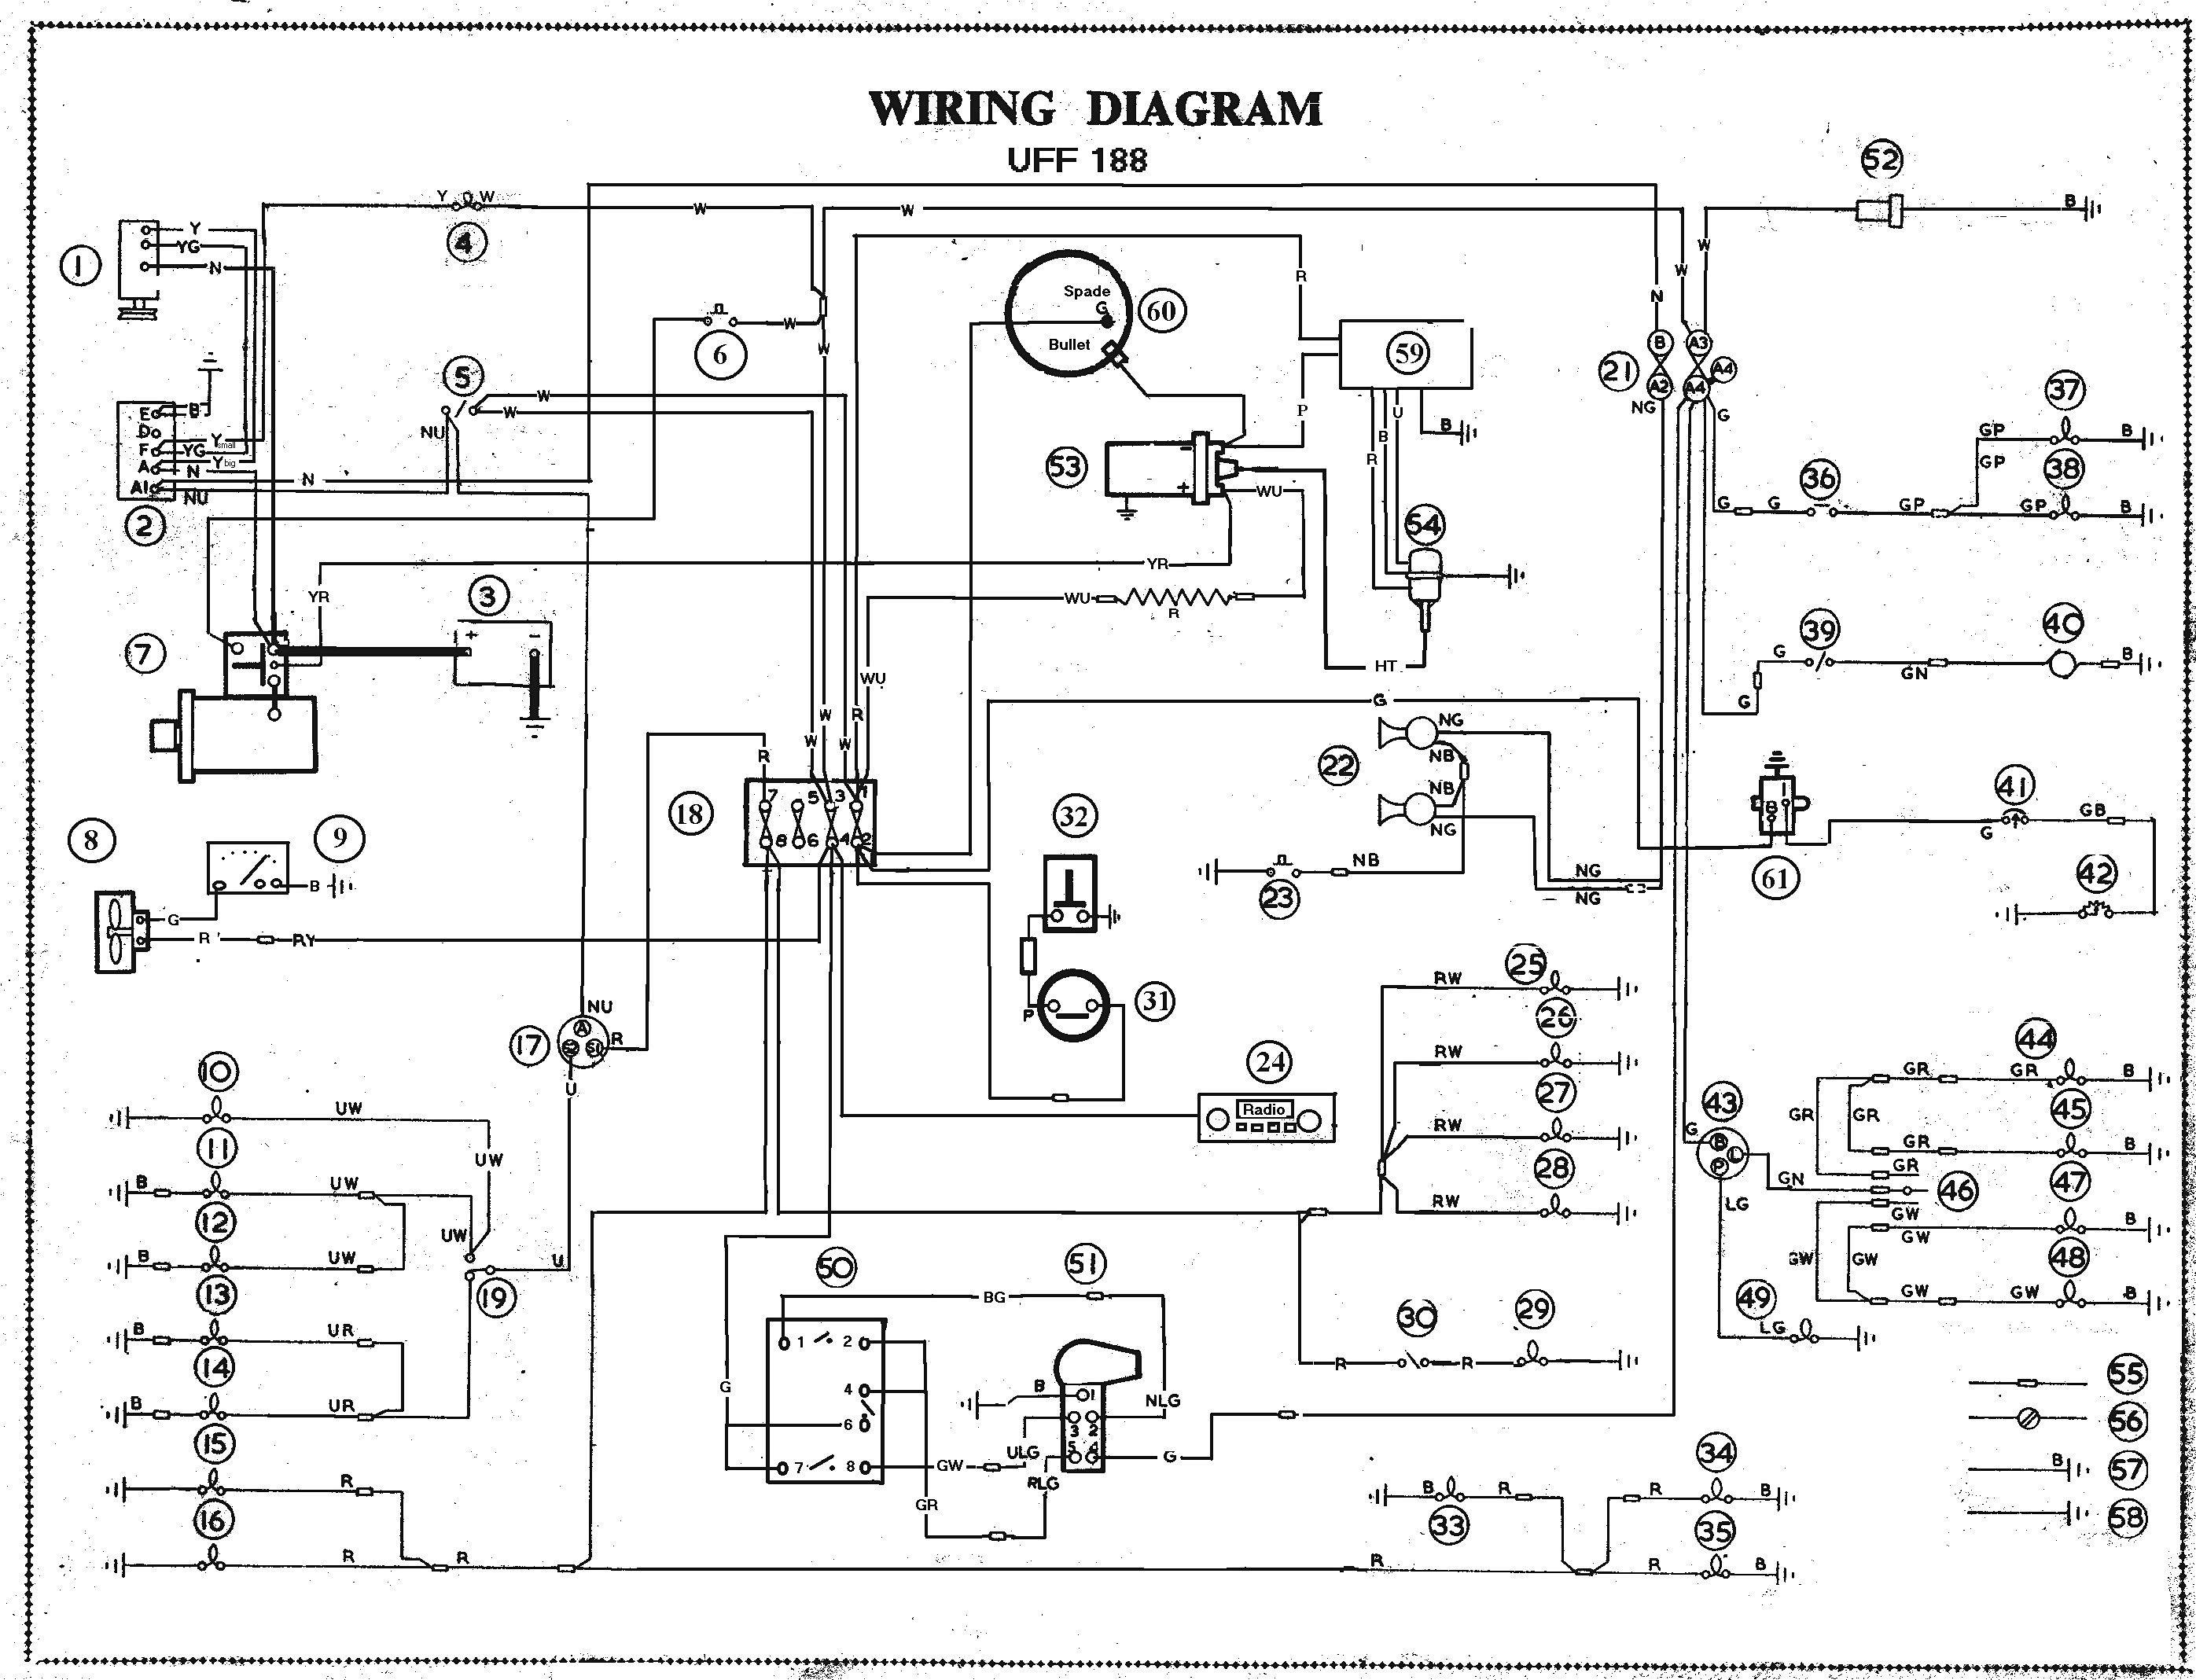 Unique Wiring Diagram Design Sample Free Download Diagrams